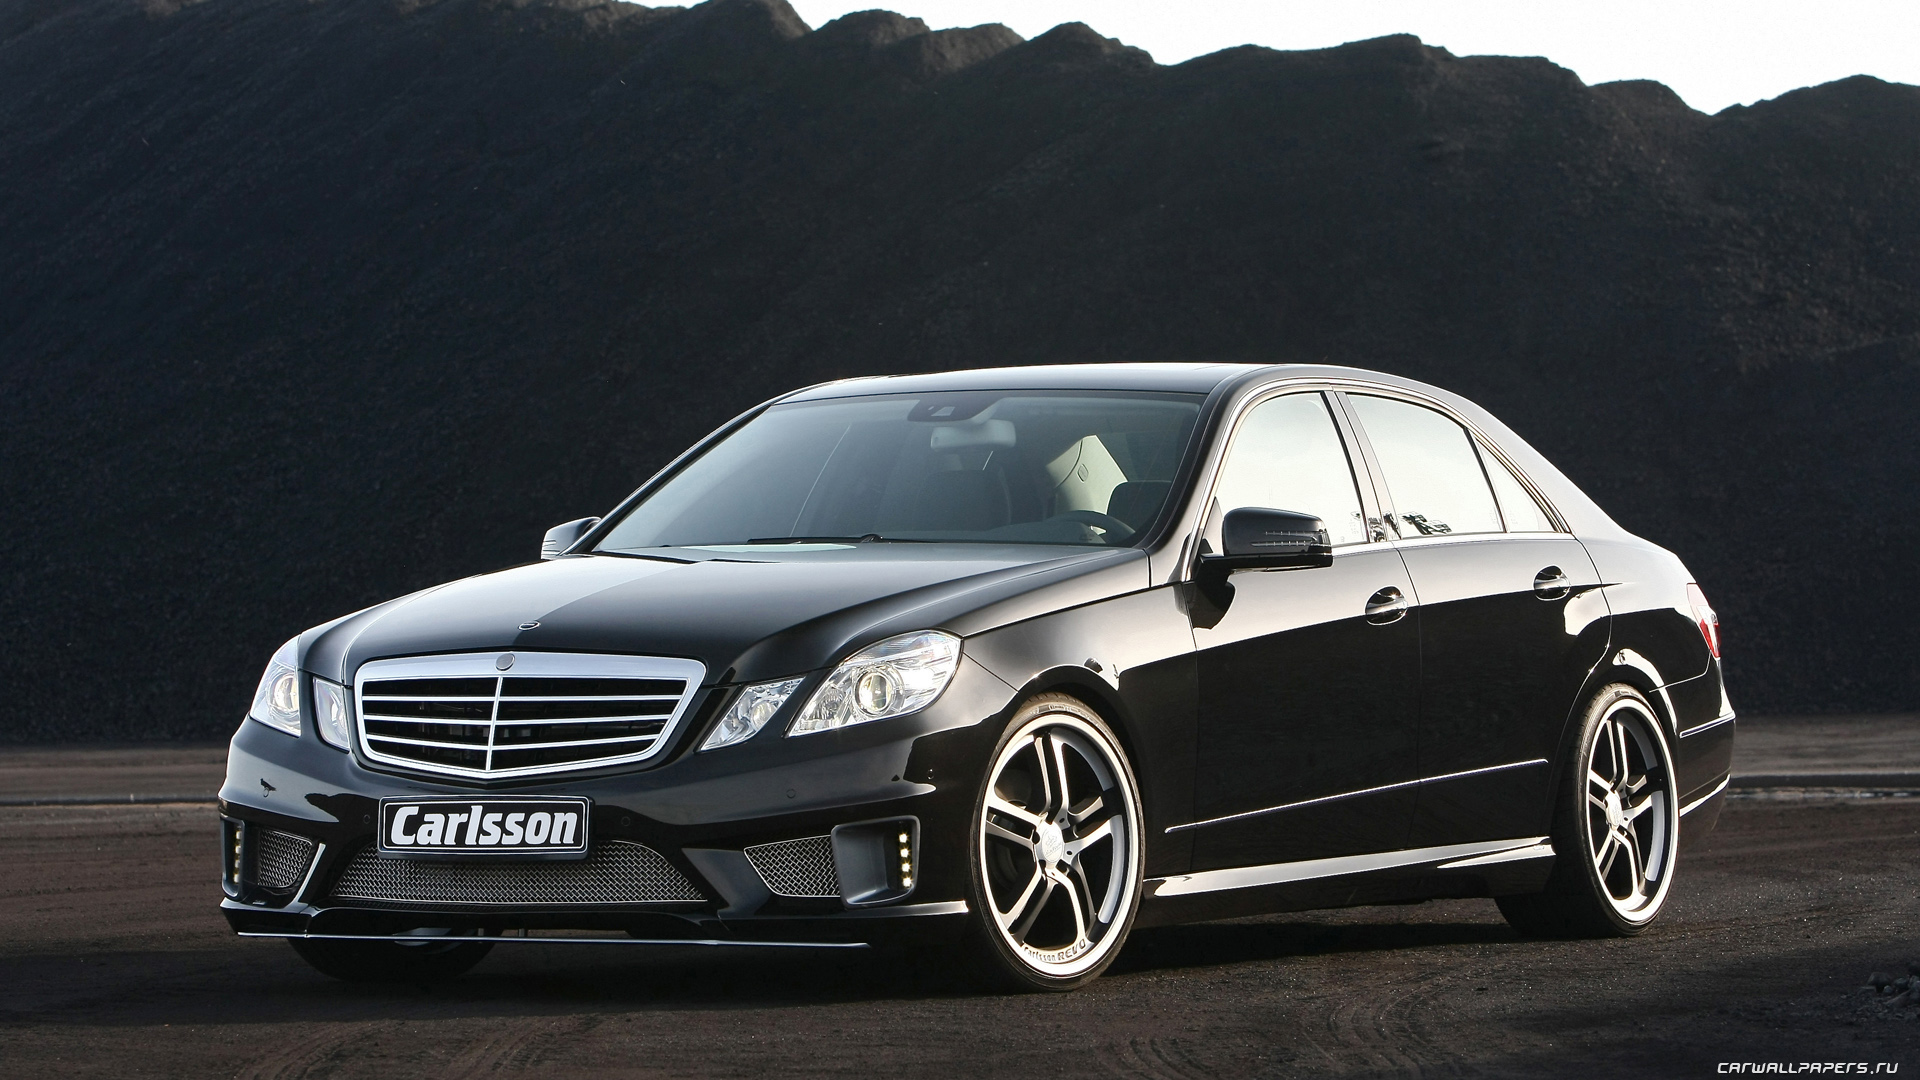 Mercedes w210 tuning 2 tuning cars -  Mercedes E Class Sedan 2011